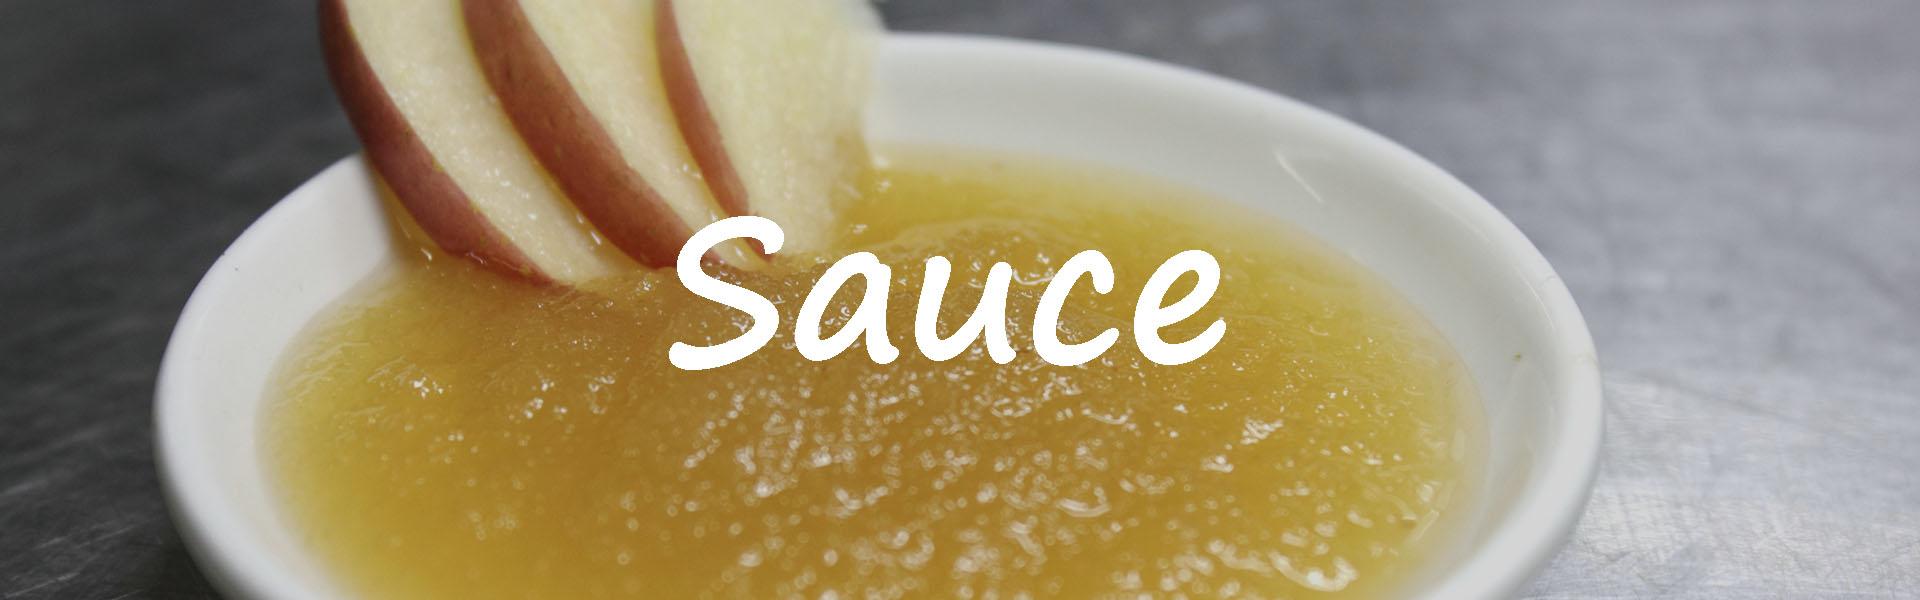 web-ready-apple-sauce-1